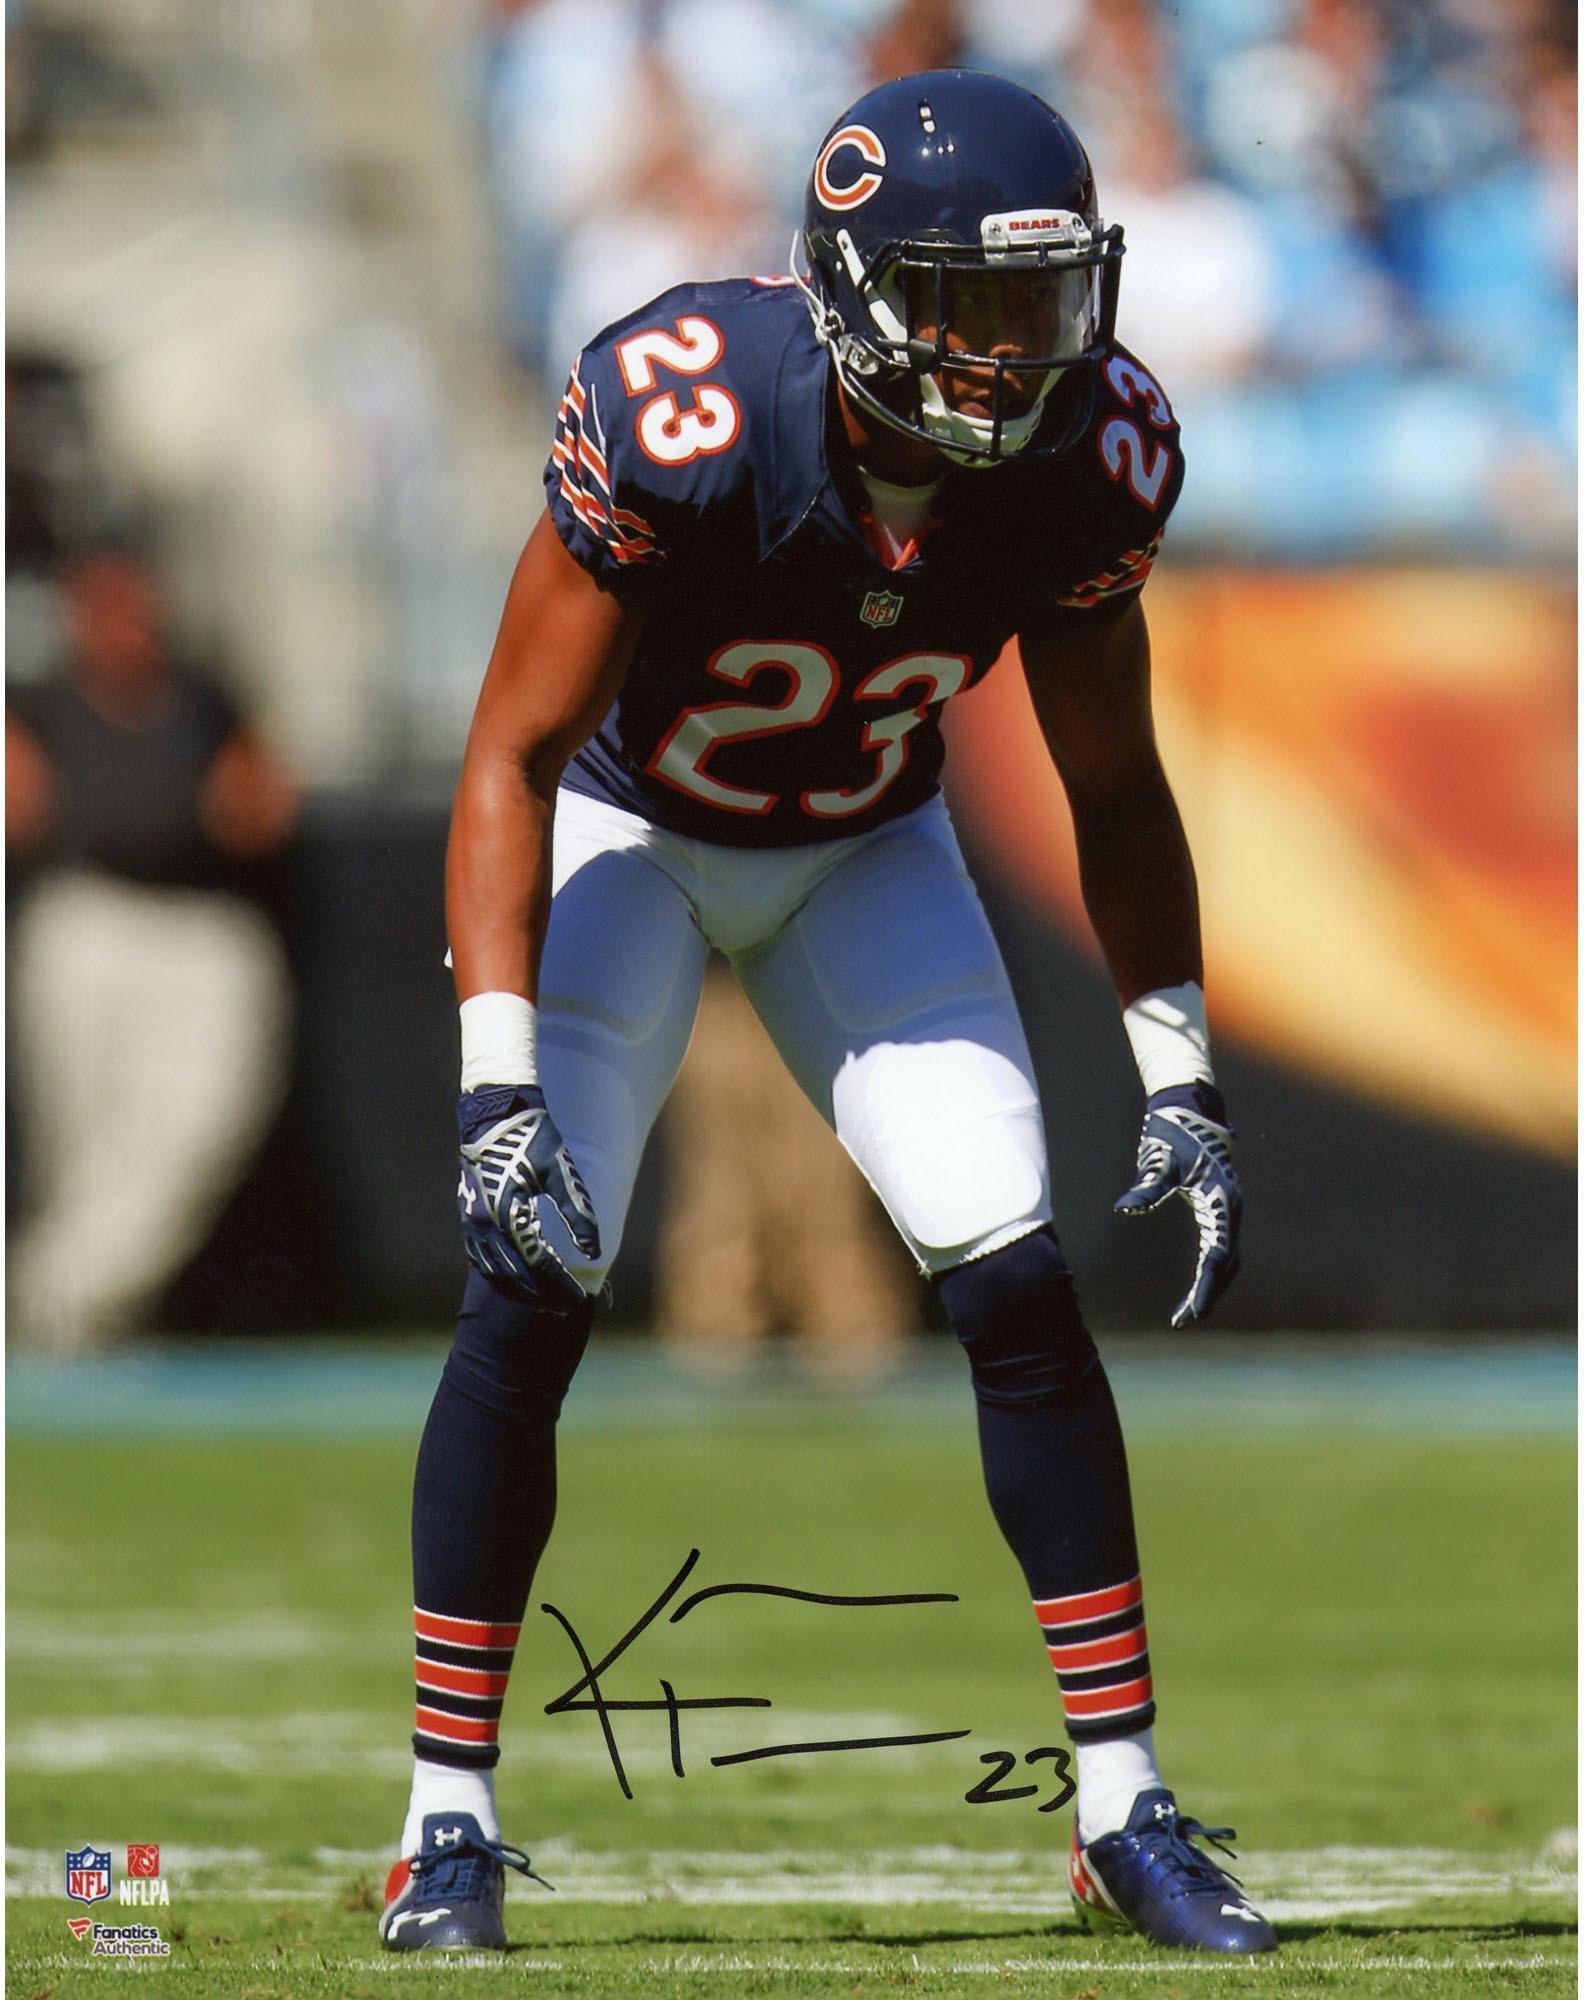 "Kyle Fuller Chicago Bears Autographed 8"" x 10"" Stance Photograph Fanatics Authentic Certified Autographed NFL Photos"